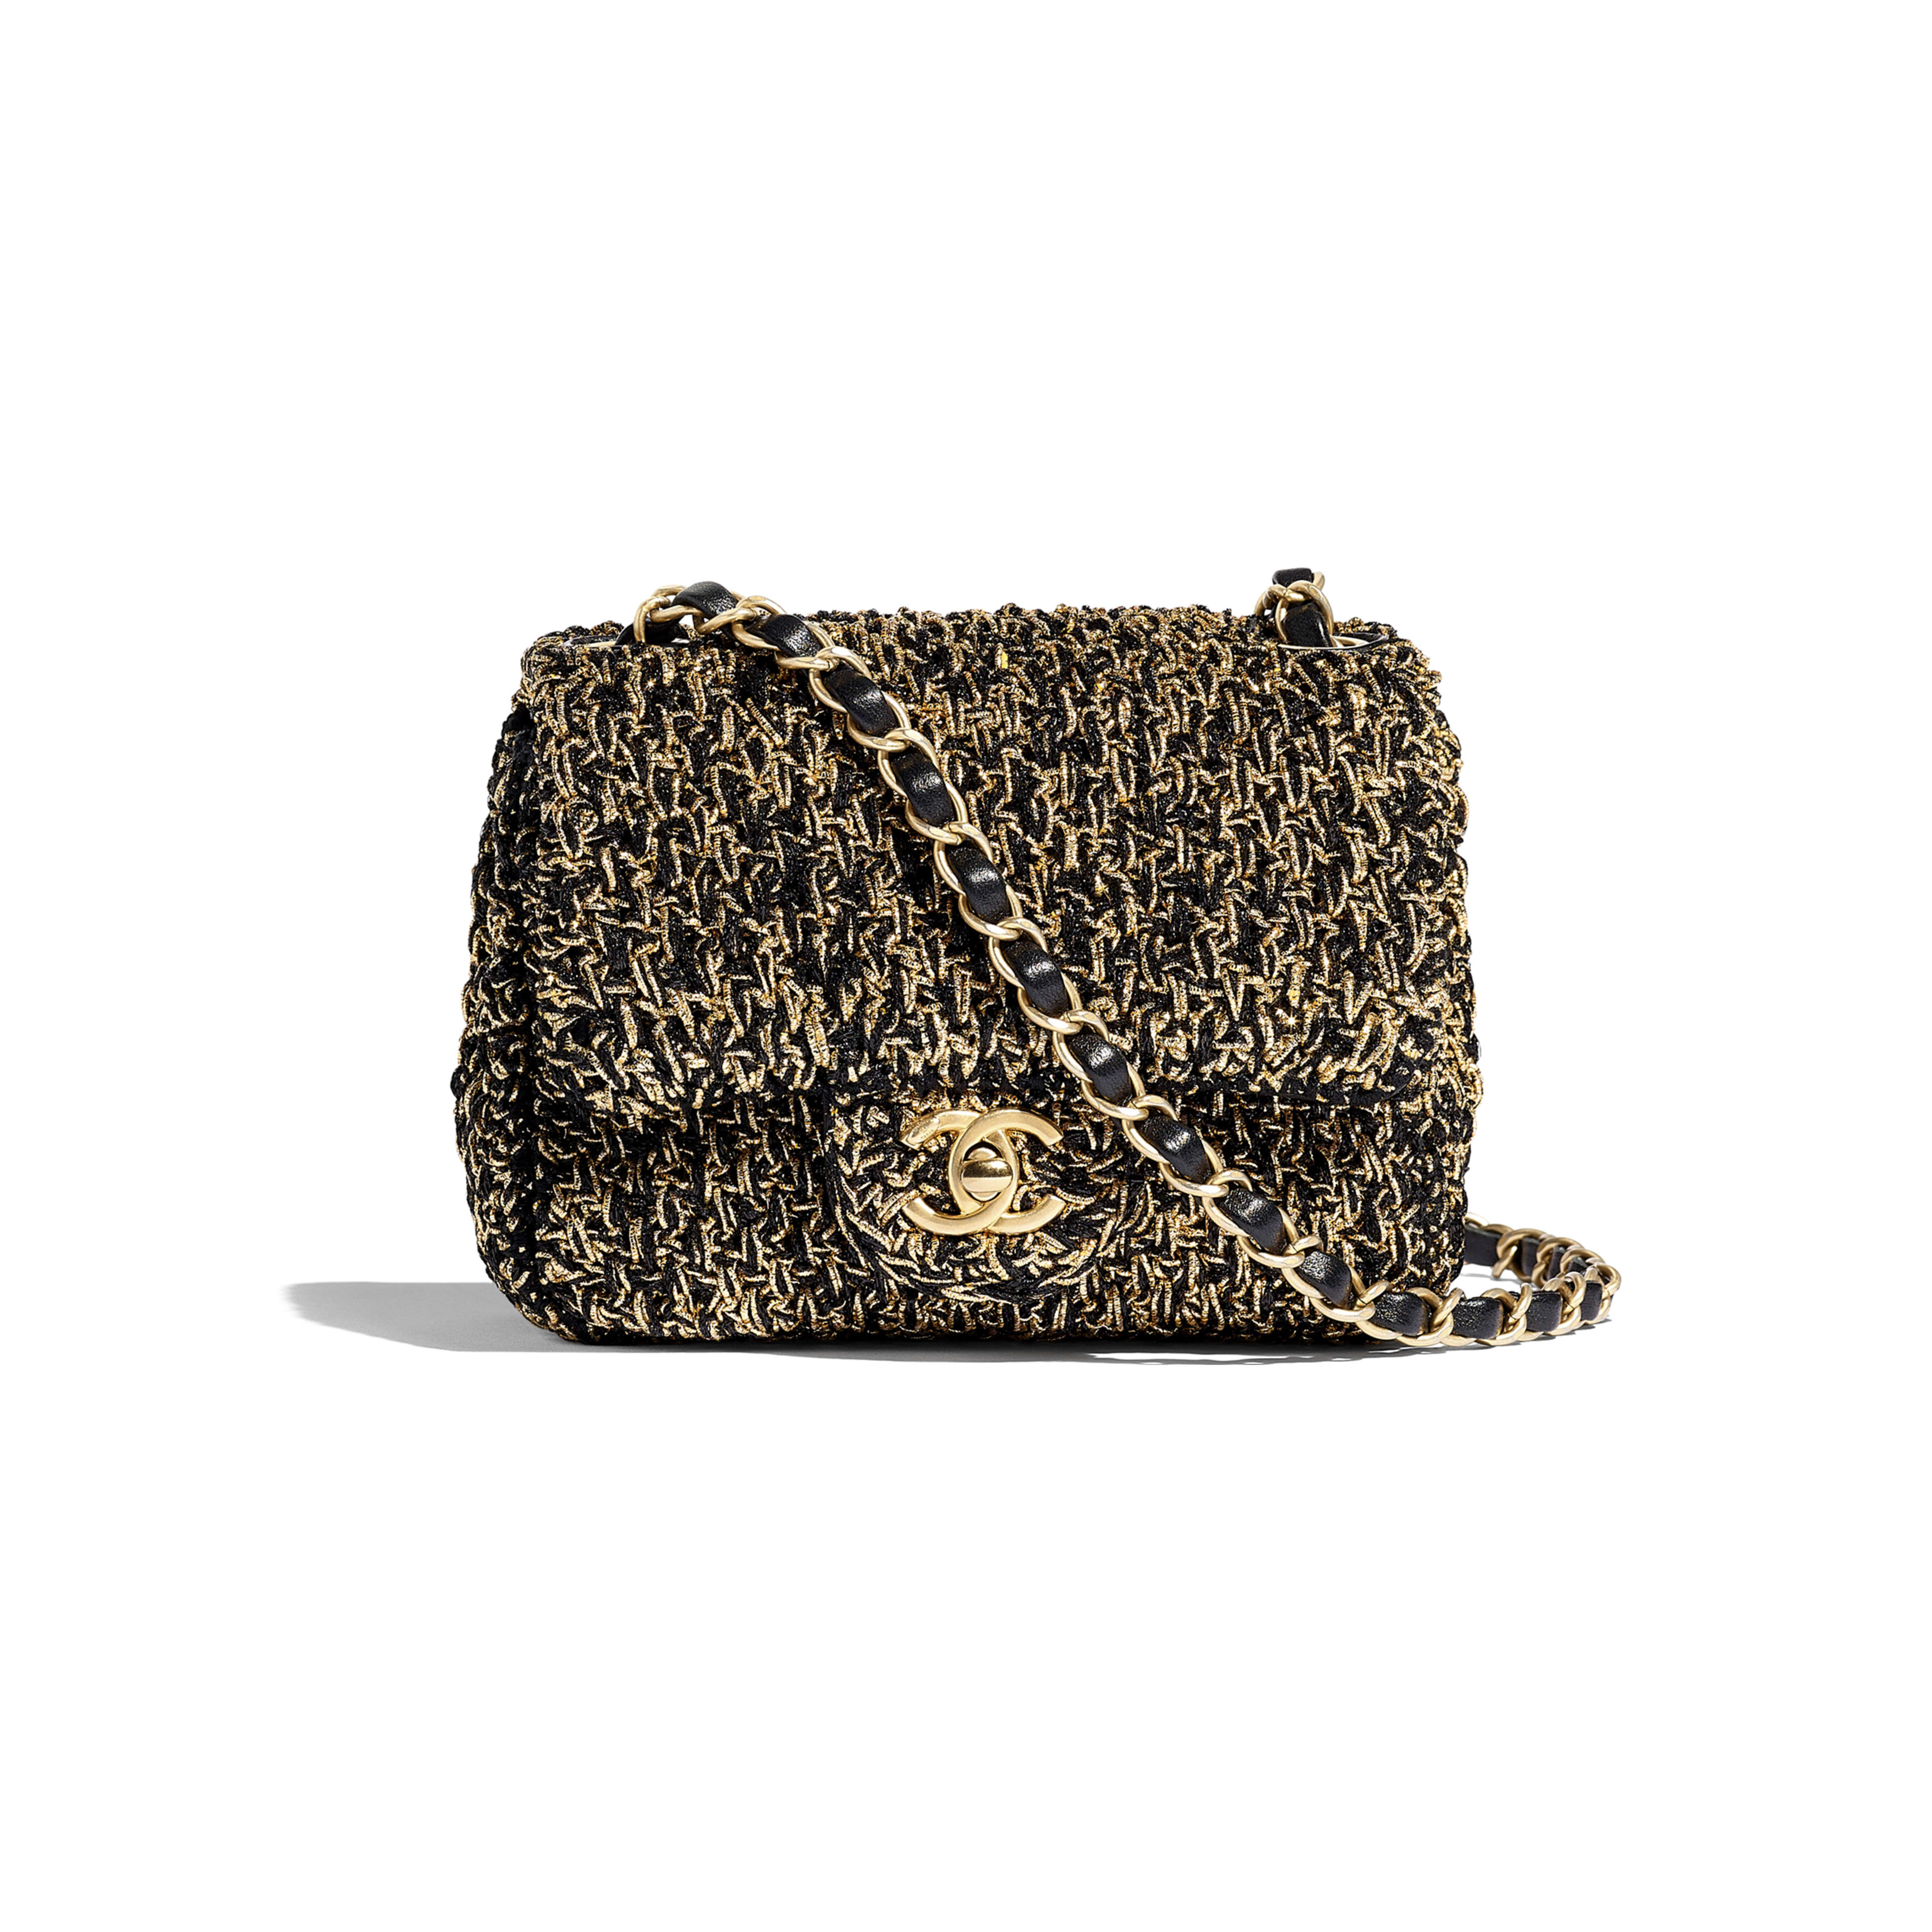 Mini Flap Bag - Black & Gold - Cotton, Mixed Fibers & Gold-Tone Metal - Default view - see full sized version